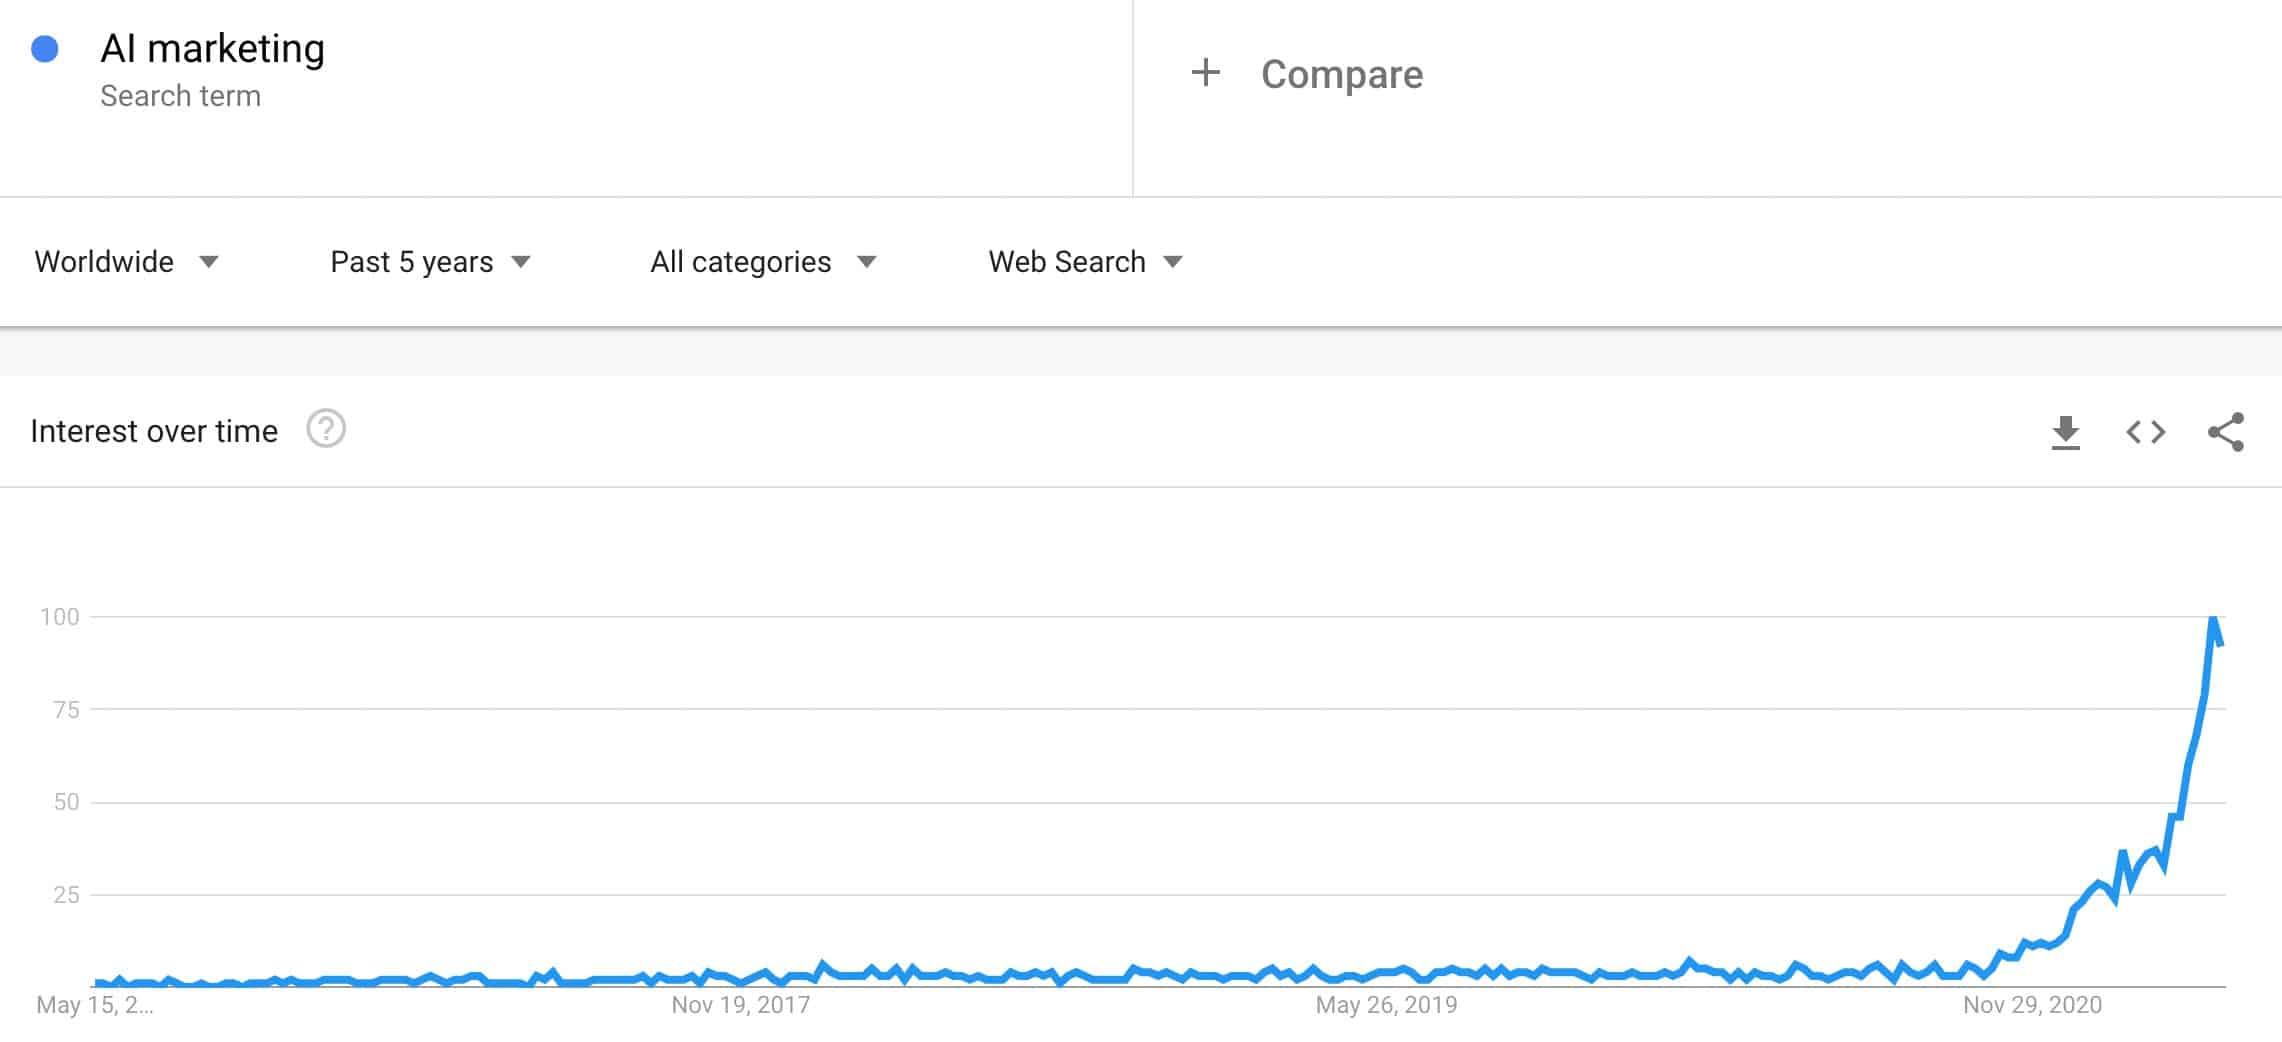 AI marketing trend